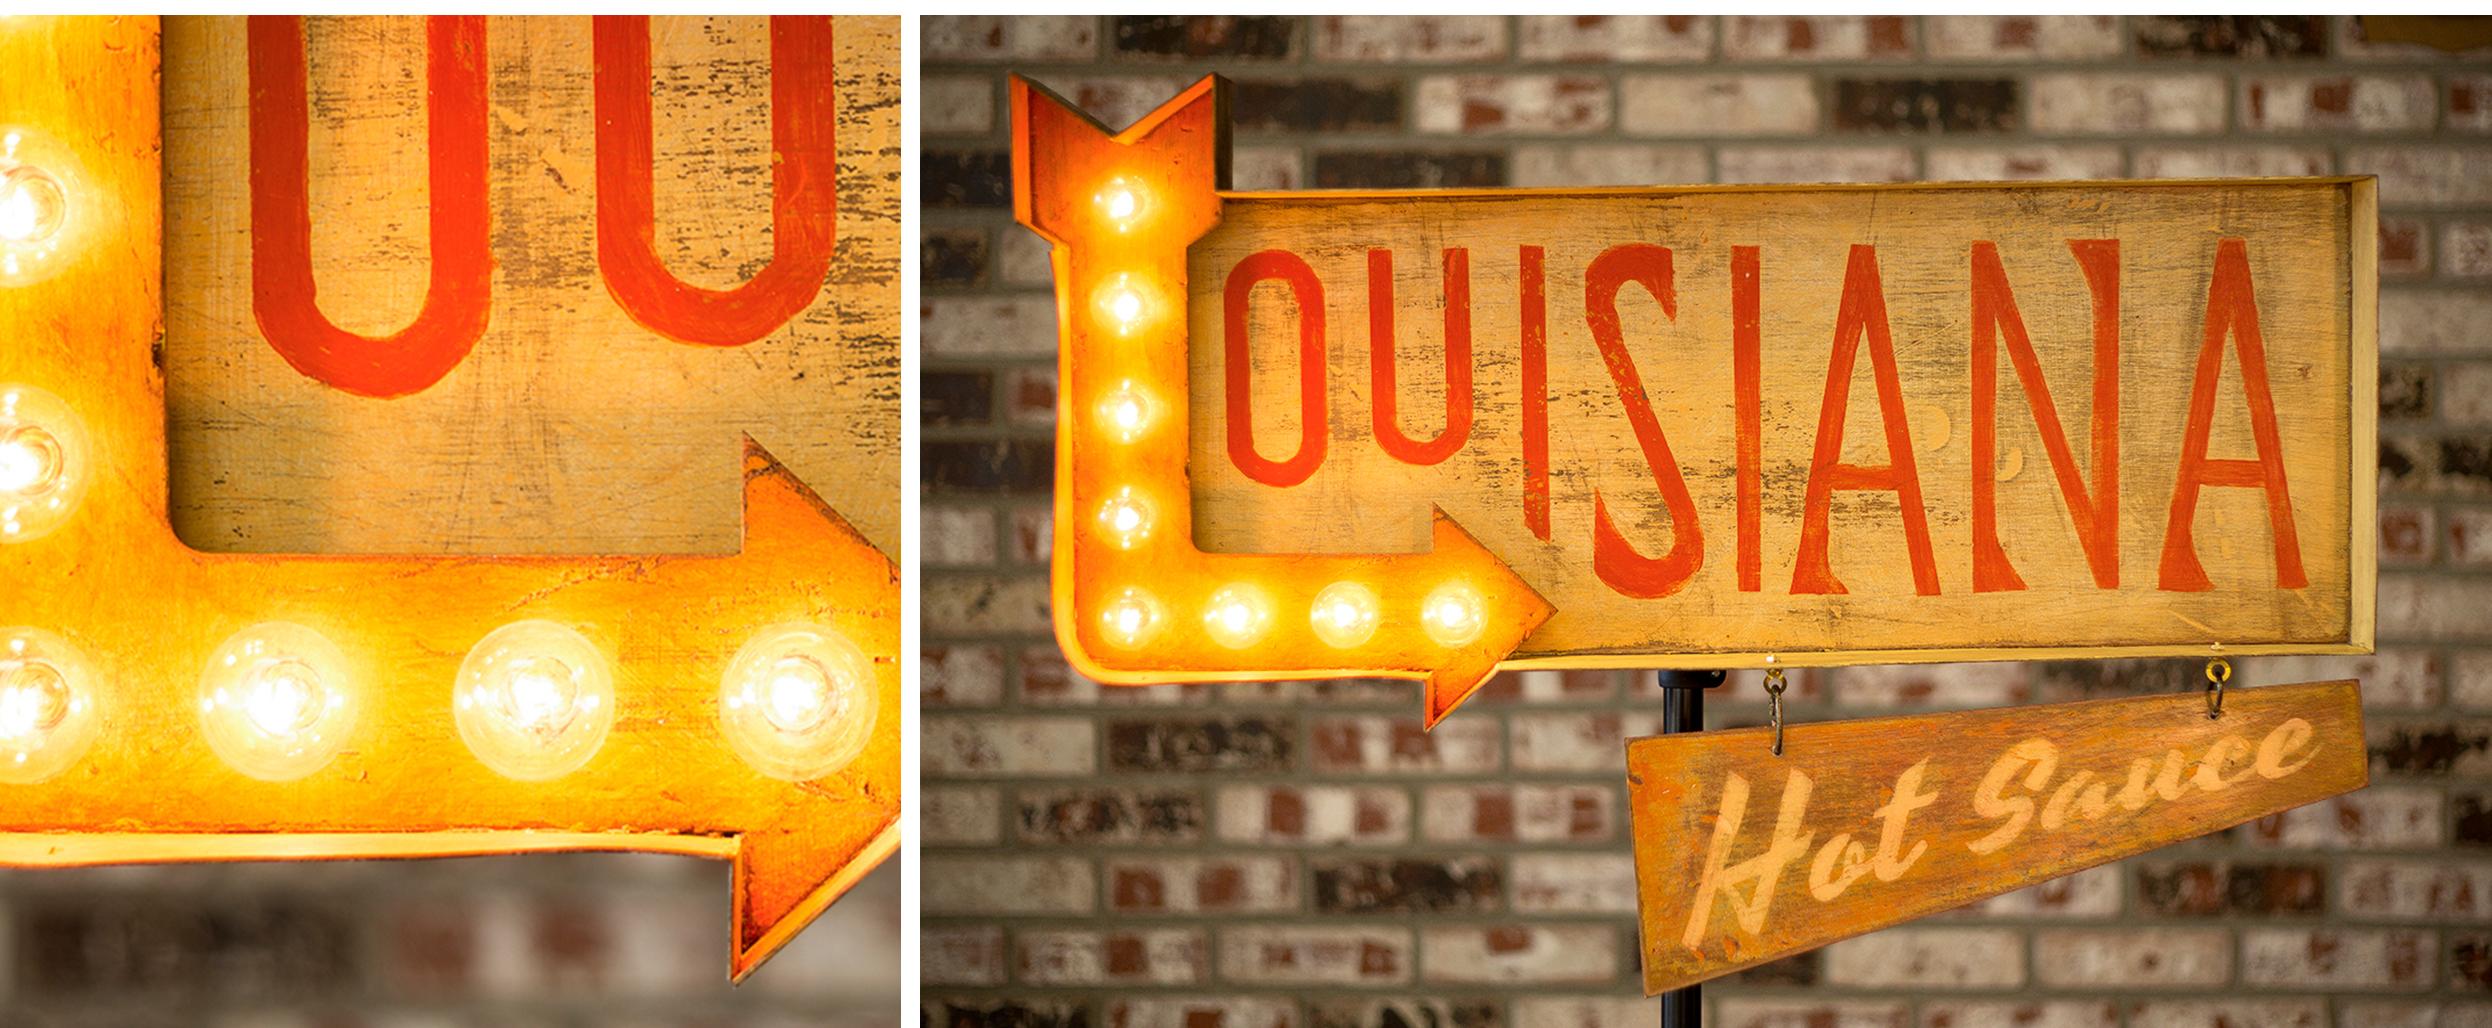 6_Louisiana.jpg